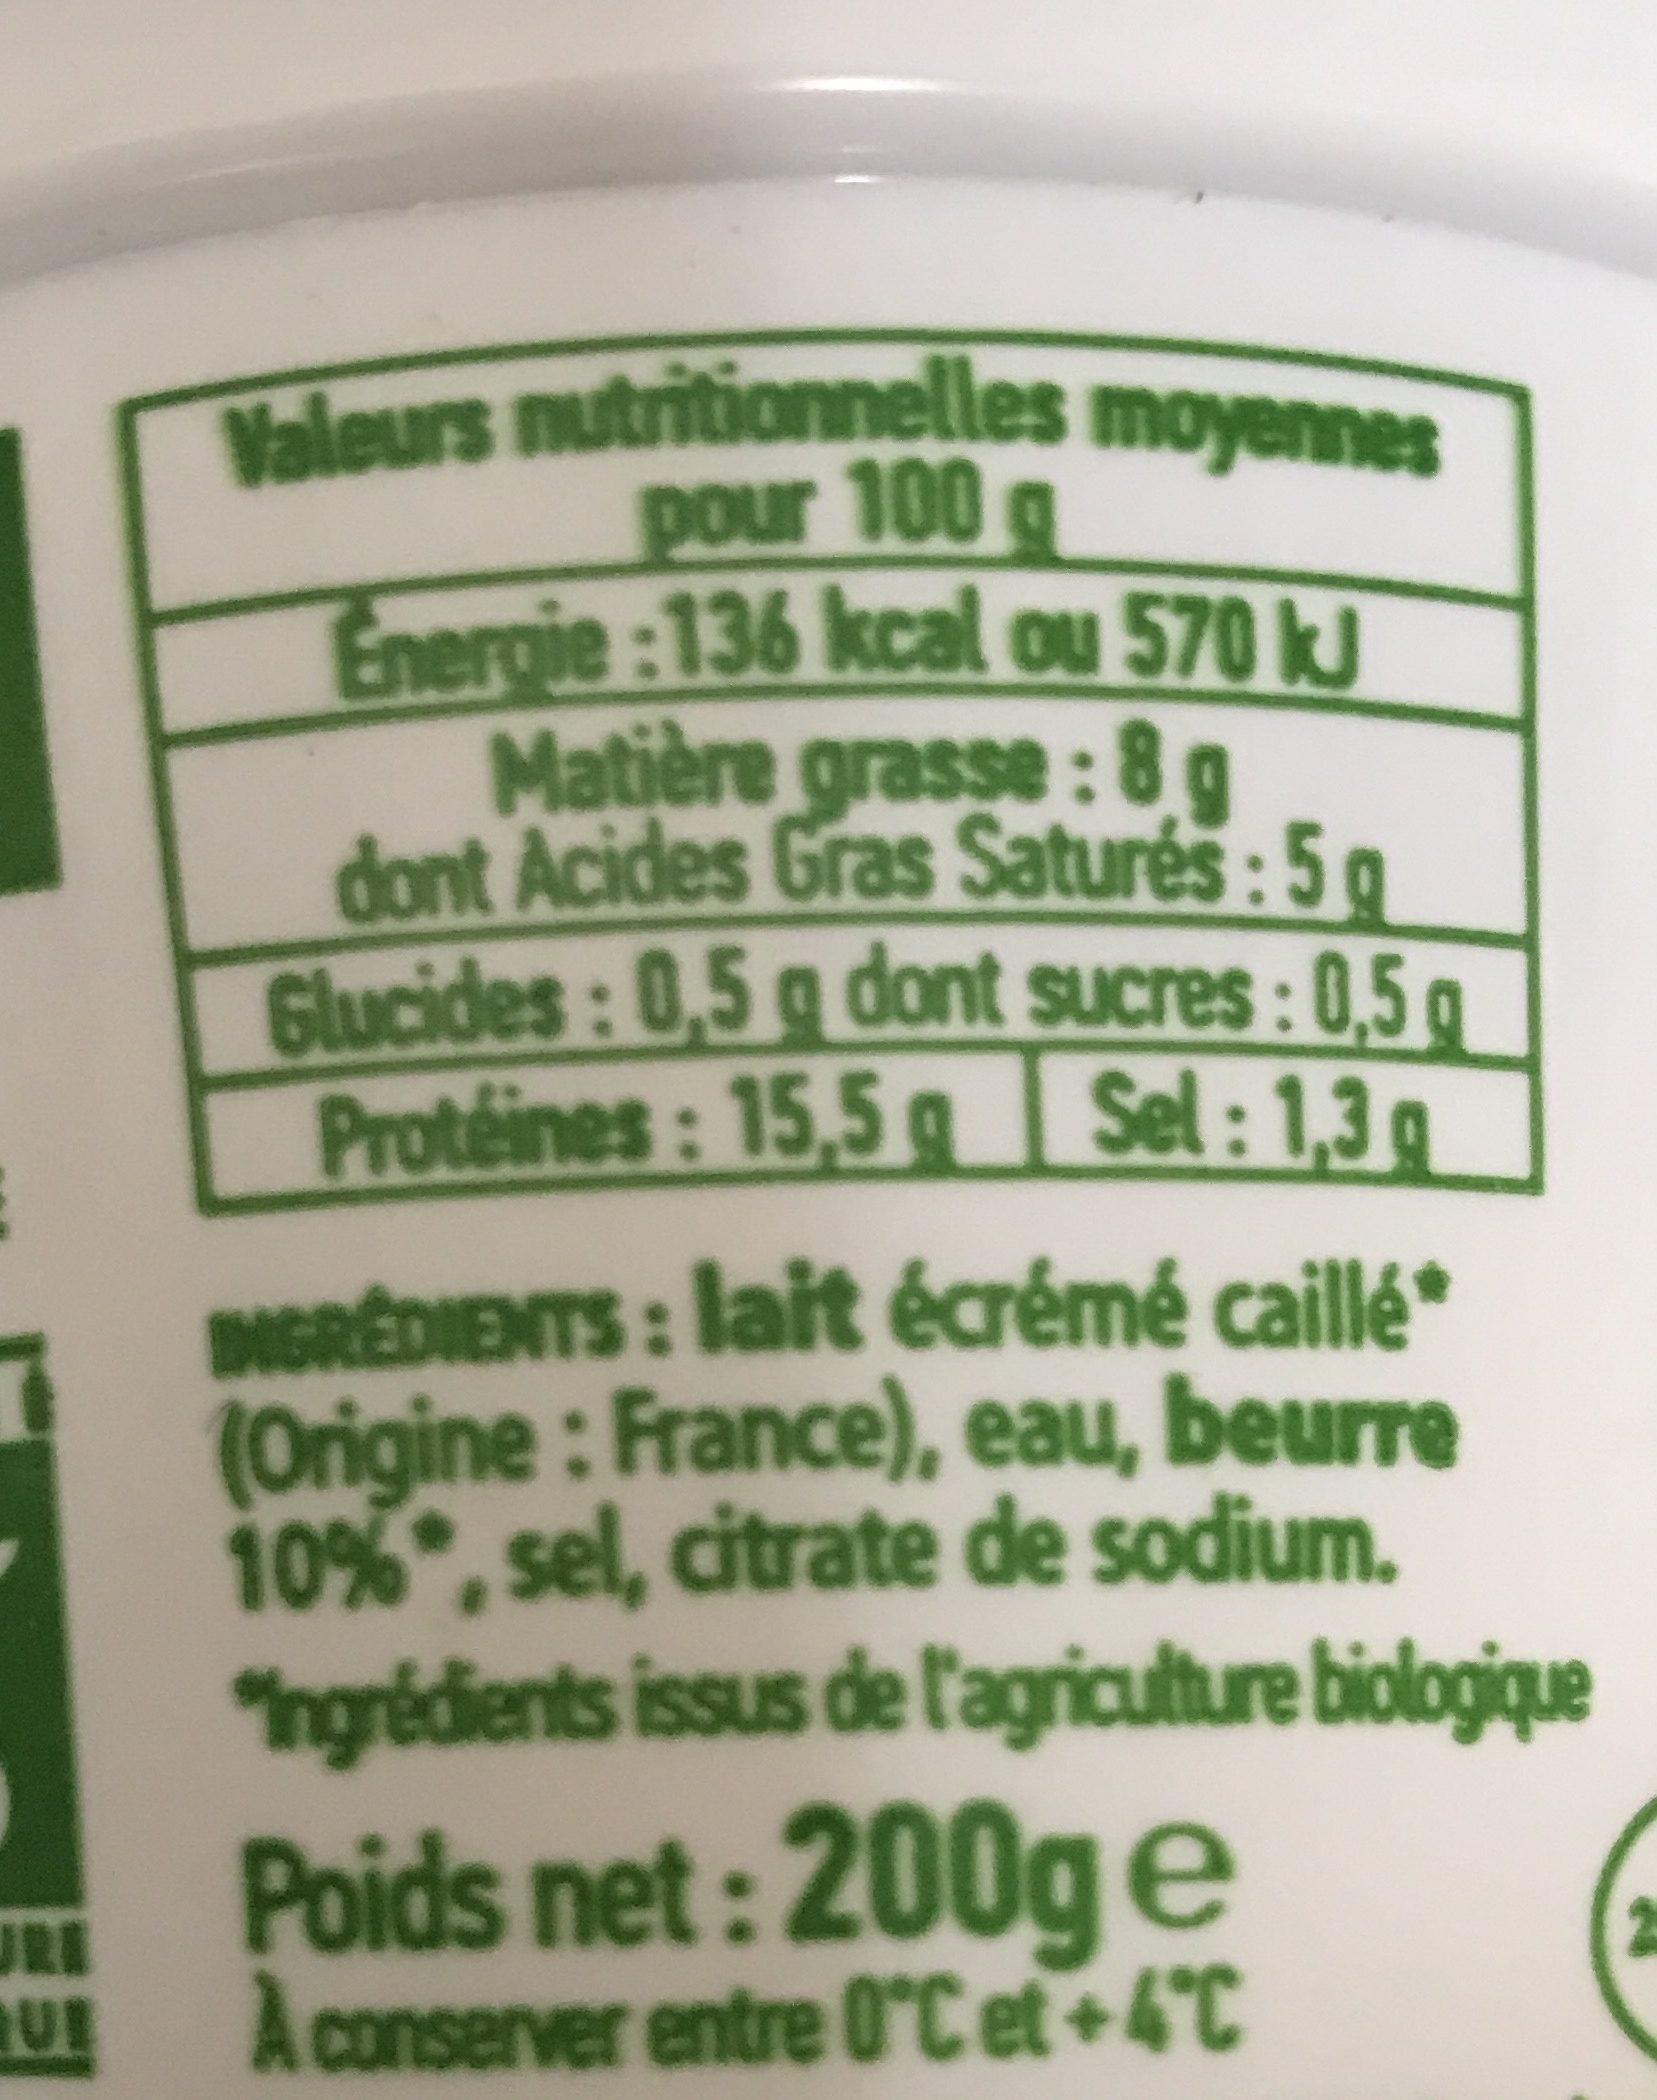 Cancoillotte La Belle Etoile Pot Bio - Nutrition facts